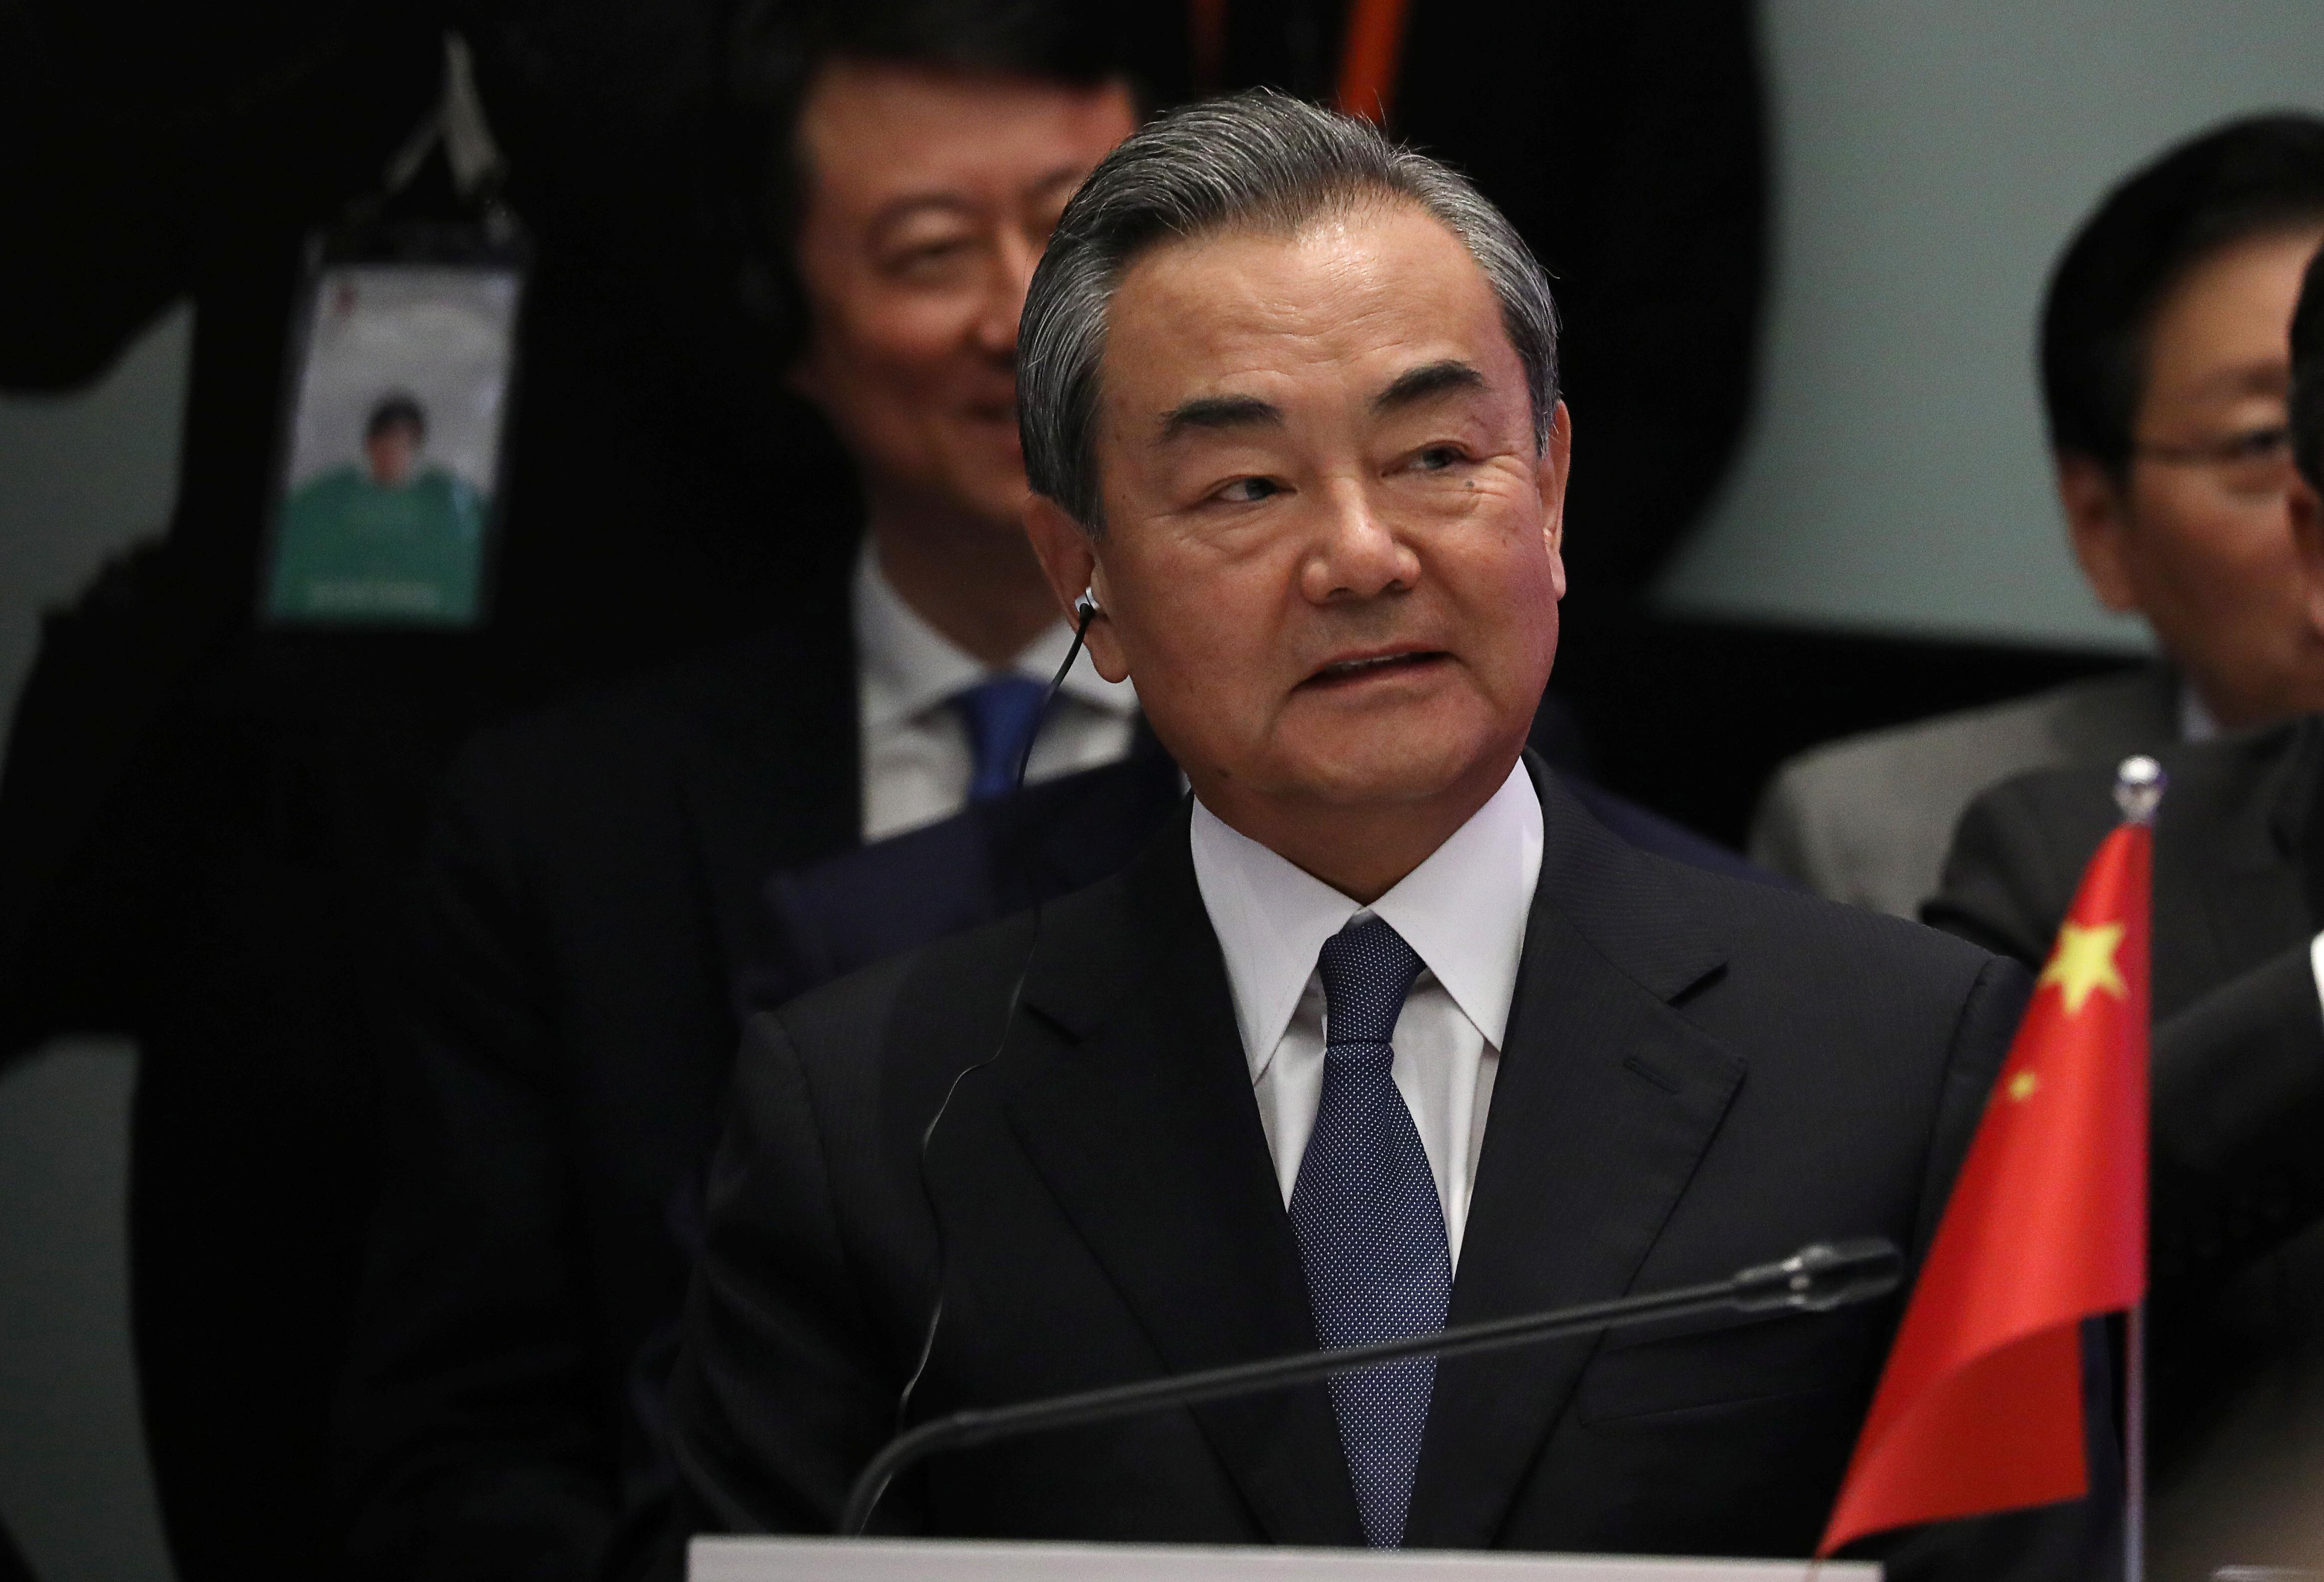 Beijing says progress on China-Australia ties 'unsatisfactory'